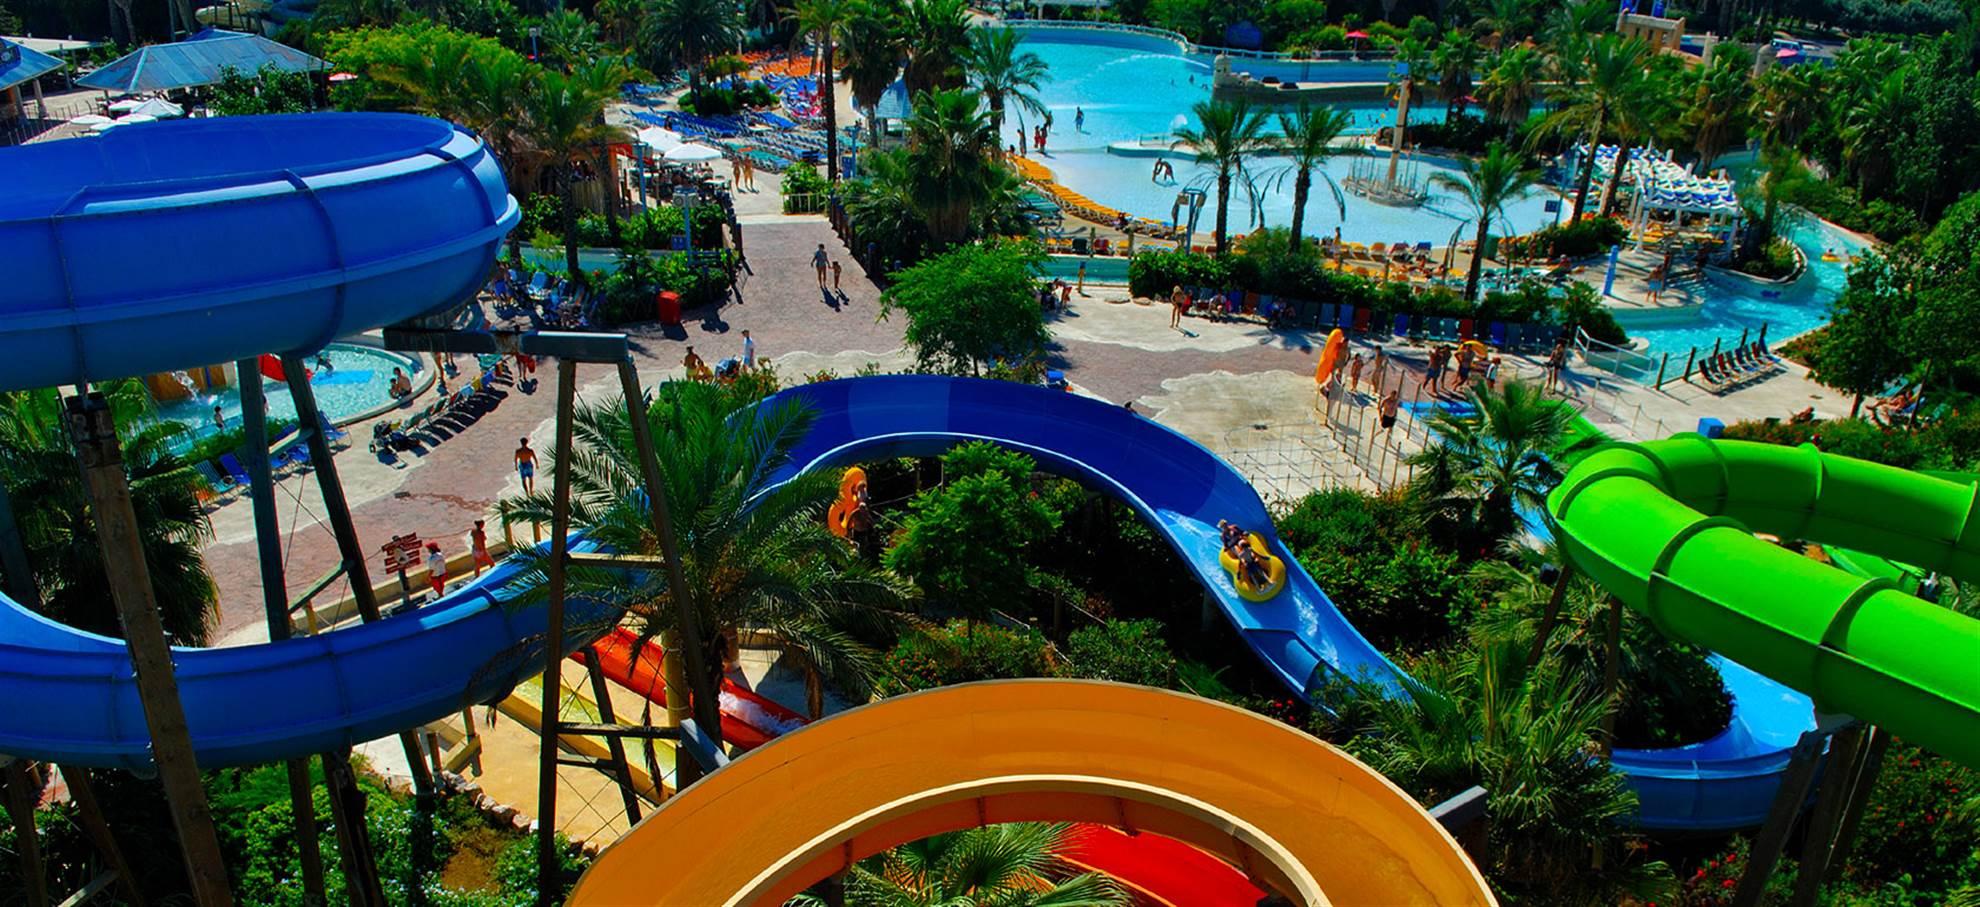 Parque PortAventura  Parque Aquático Caribe